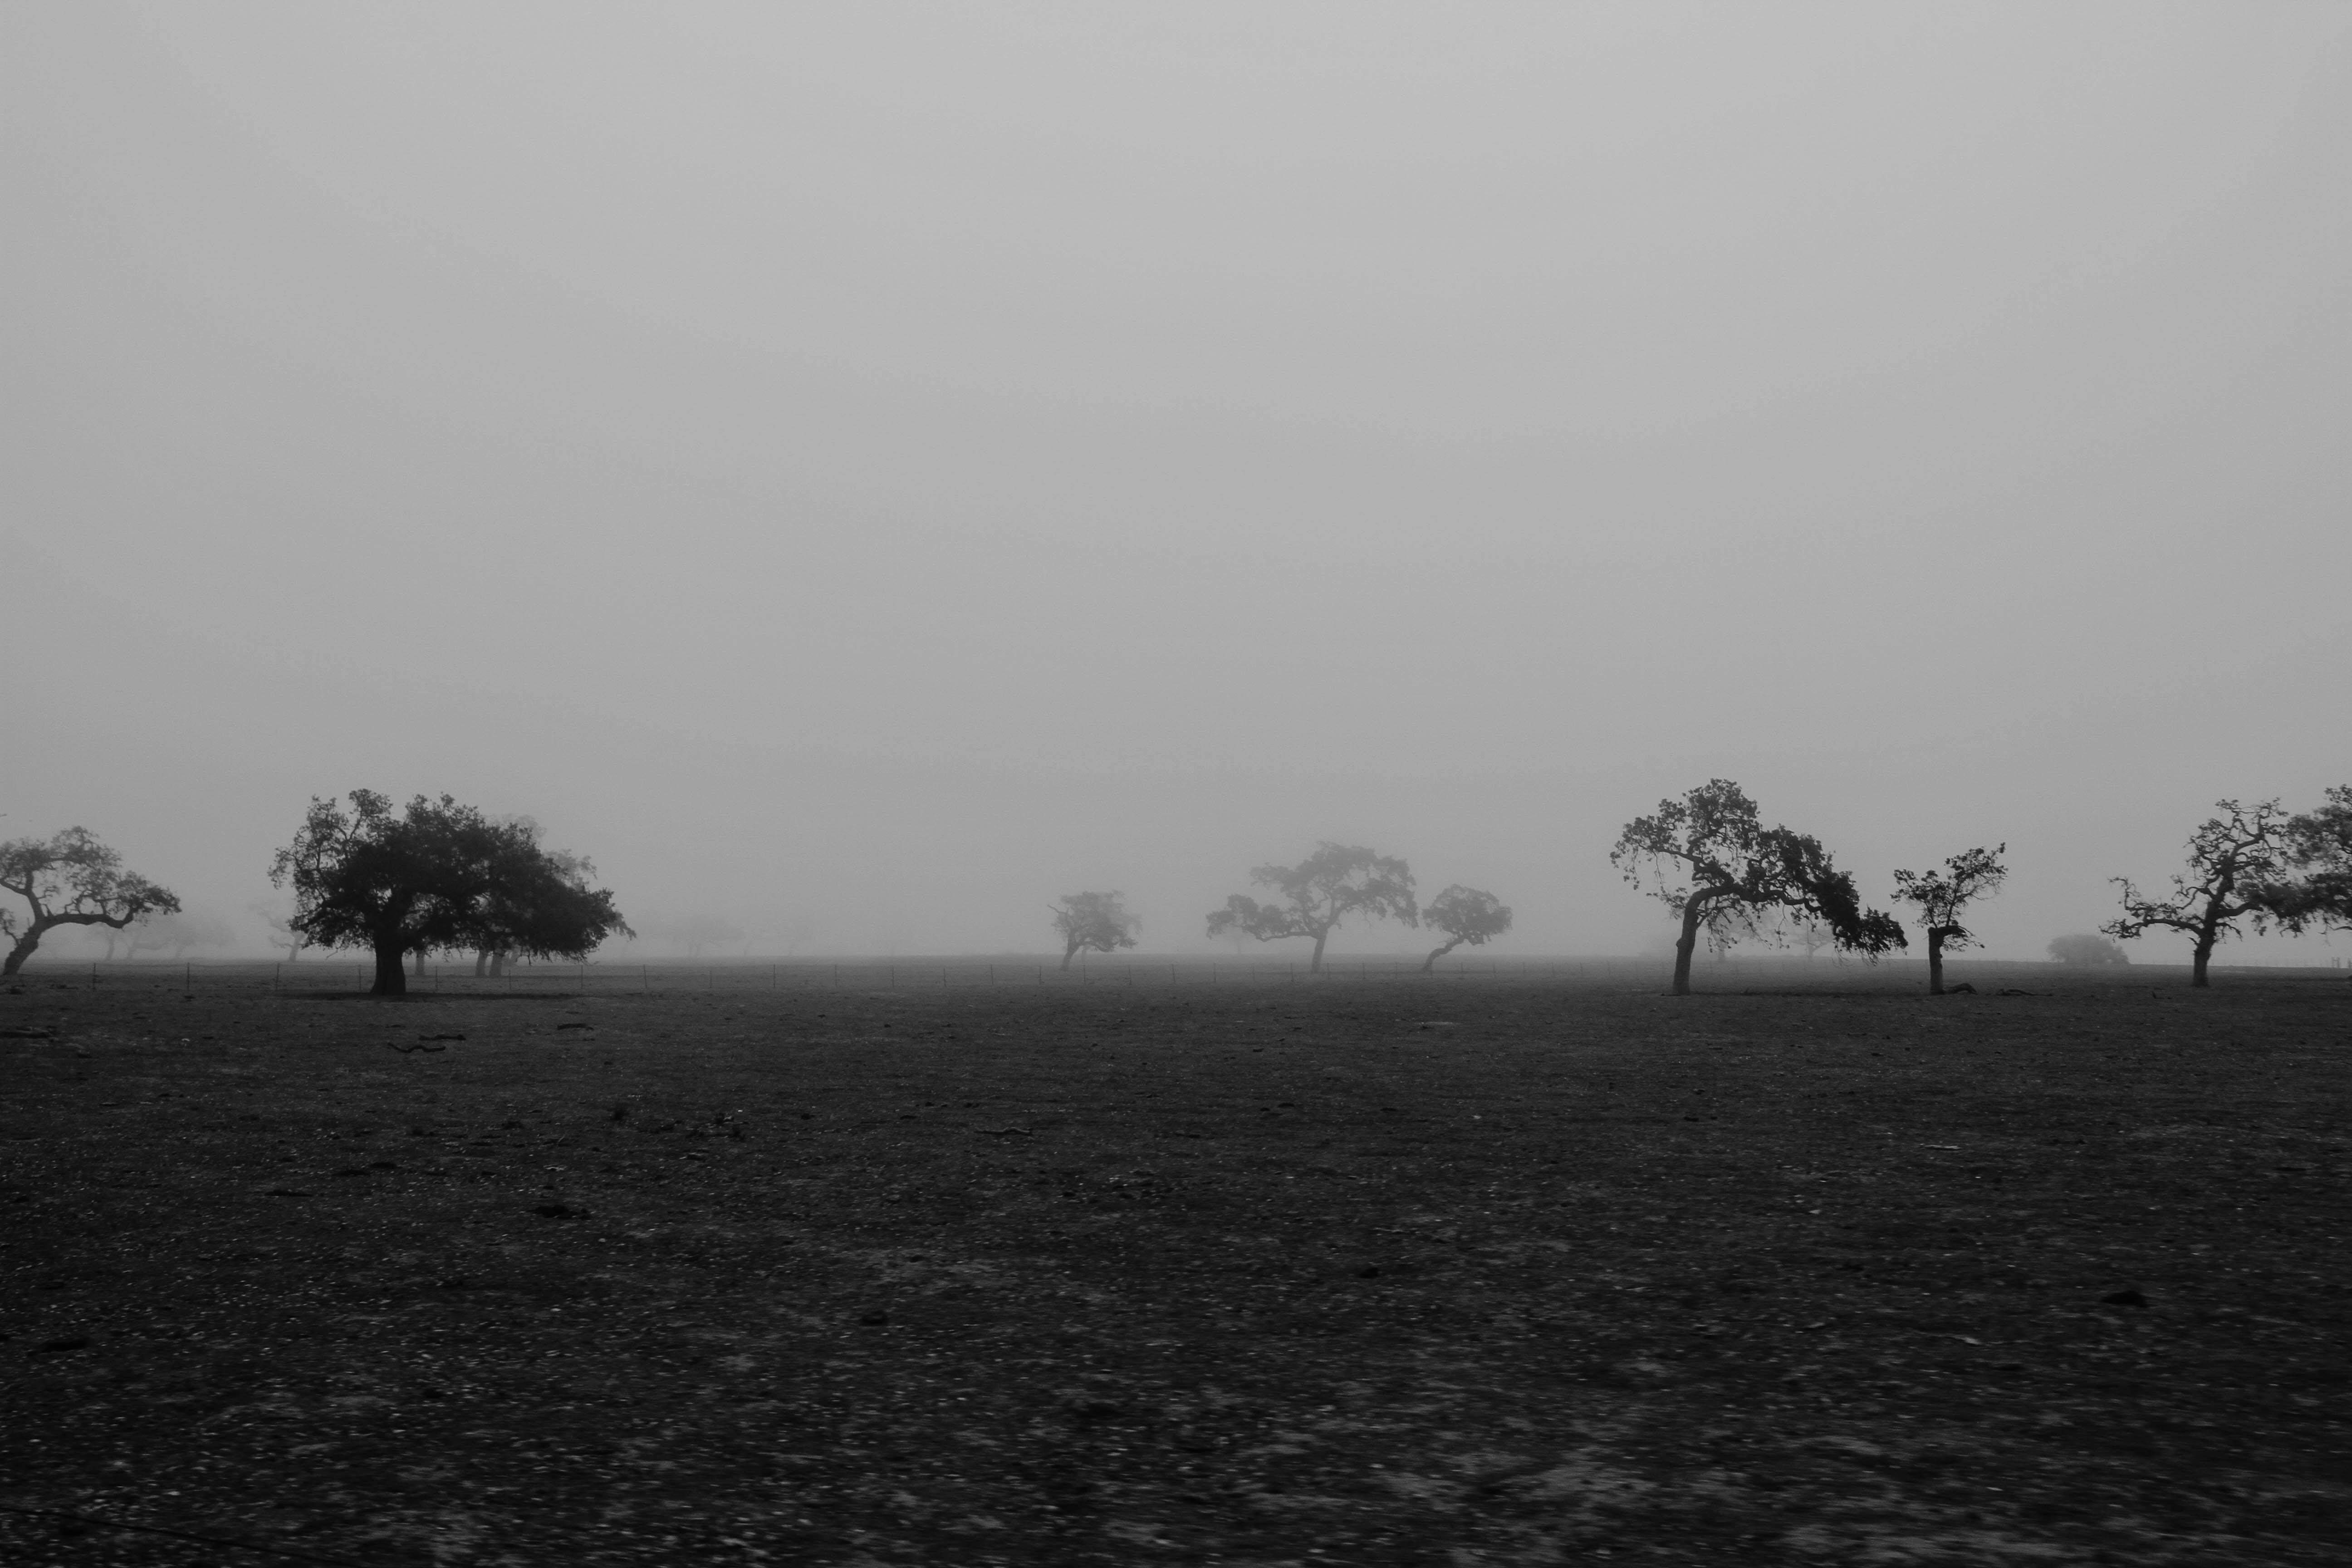 landscape photo of trees under fog background